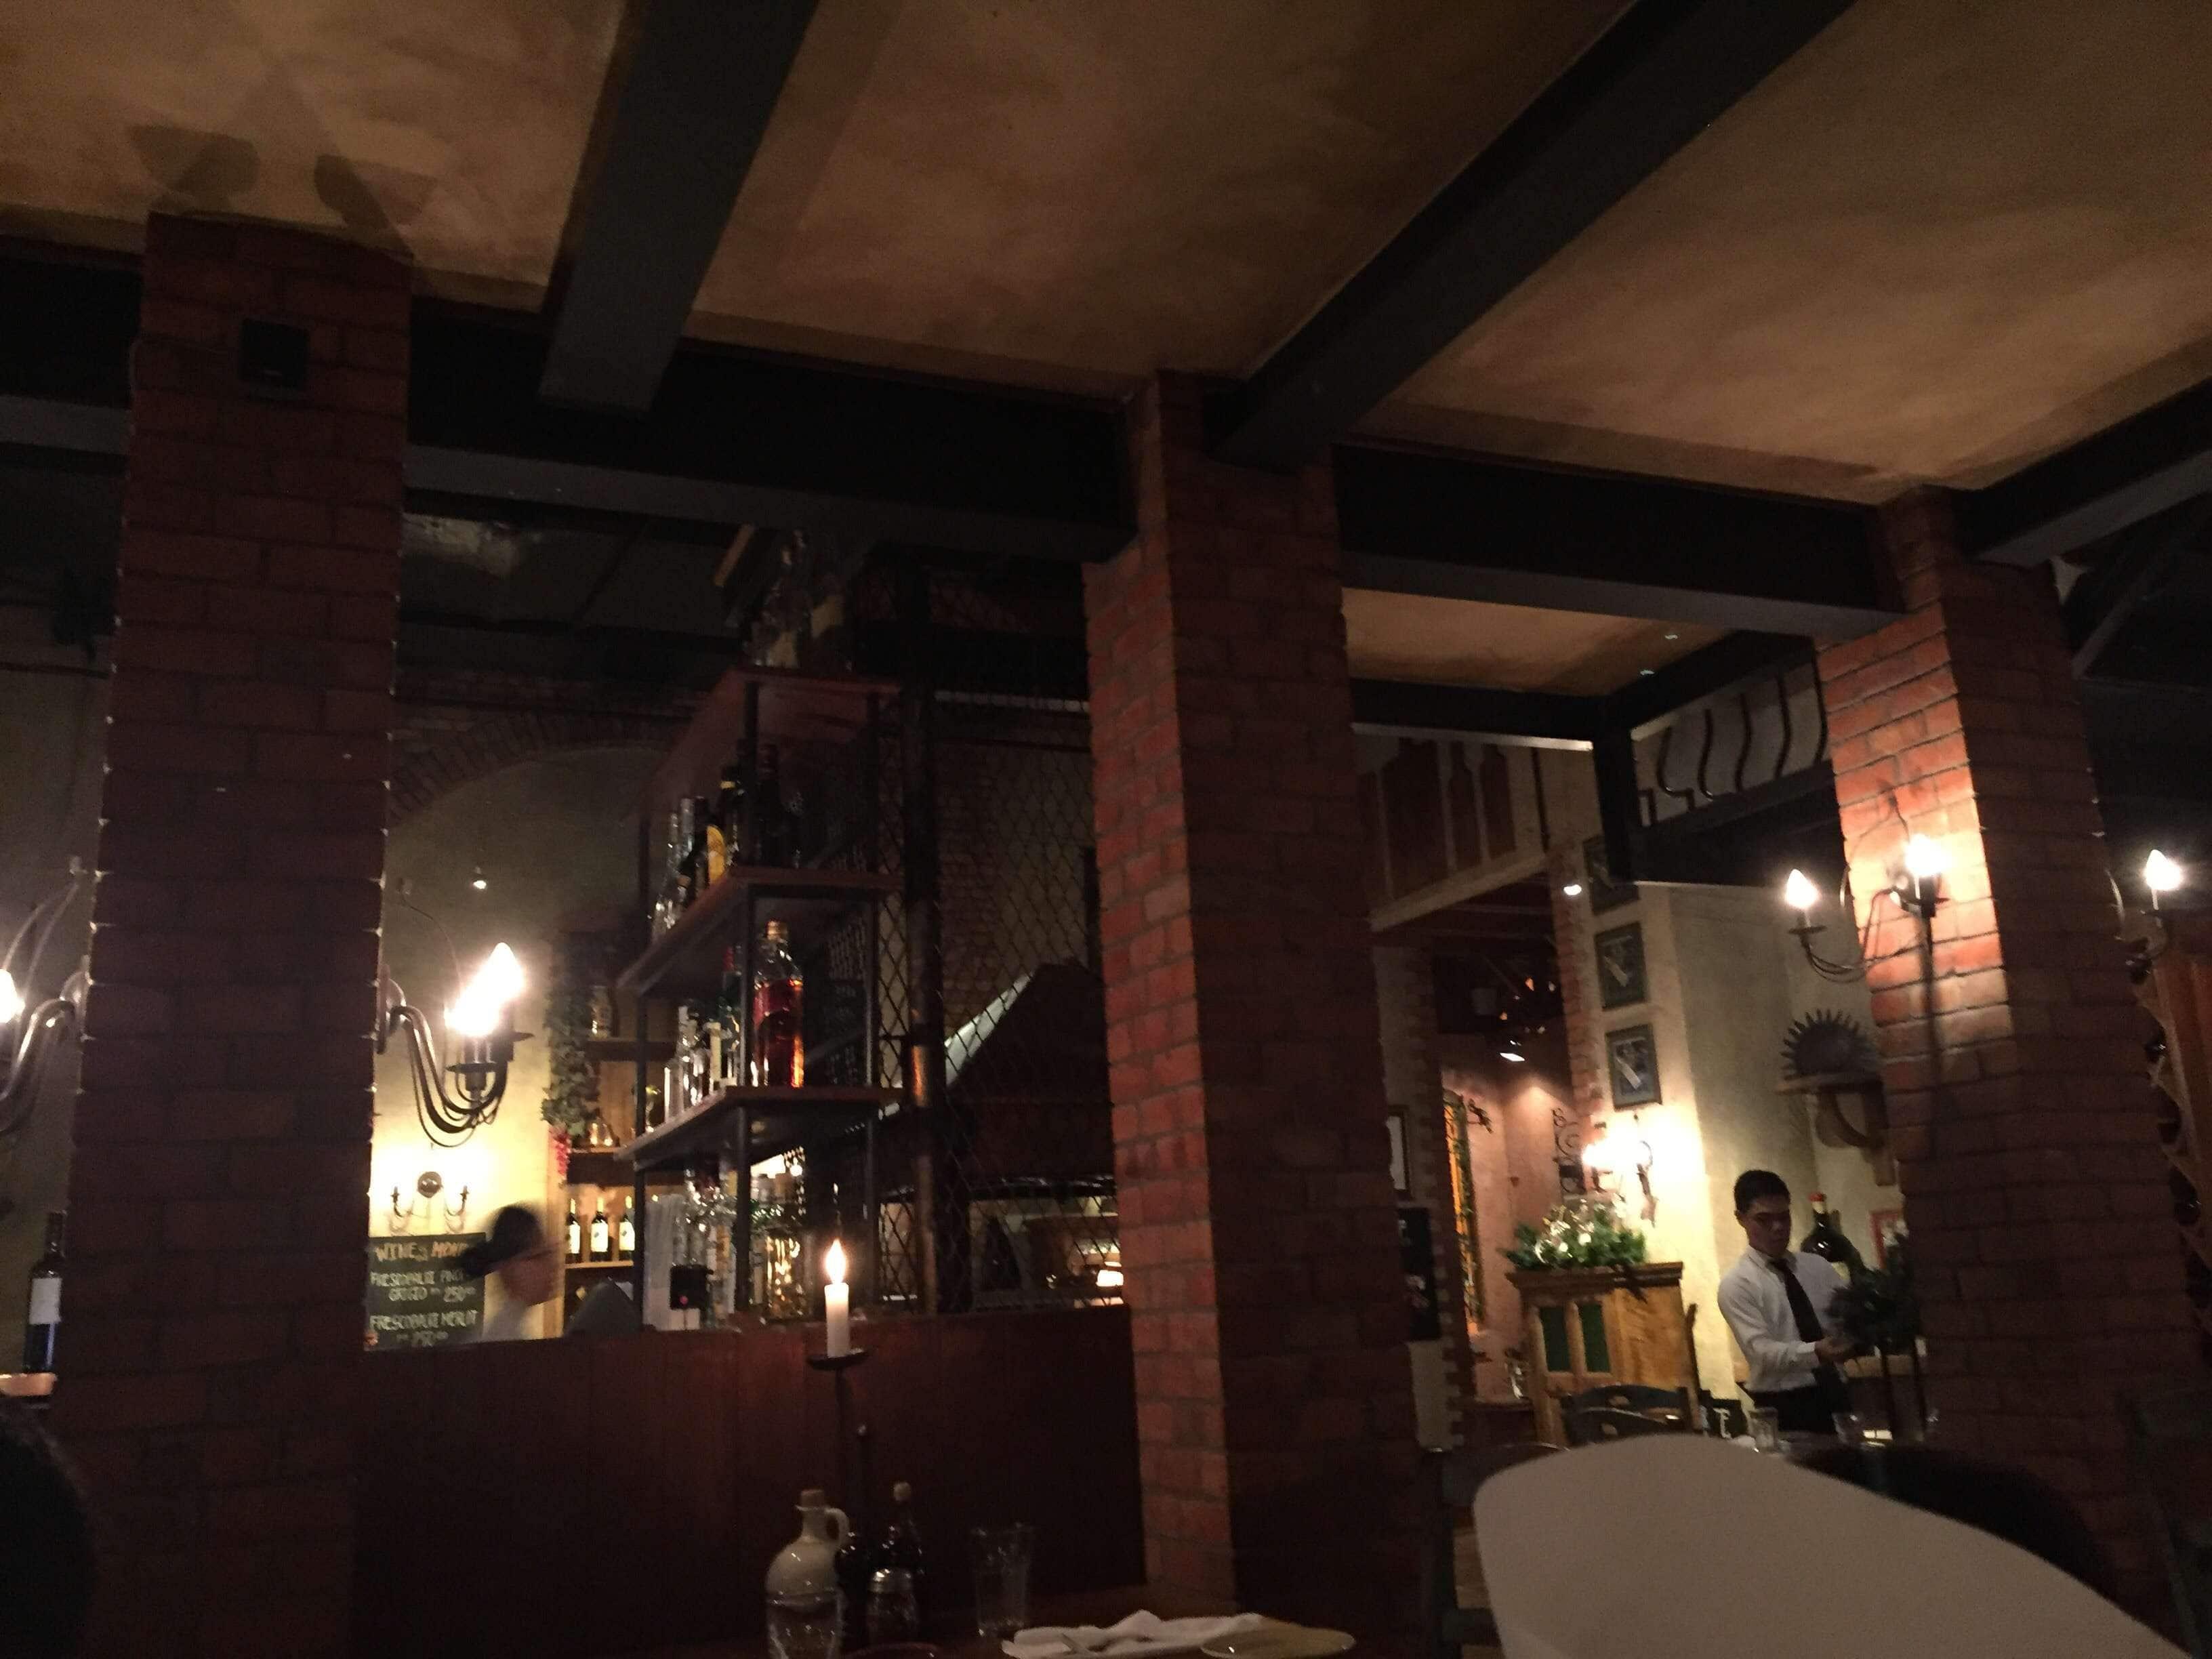 Sidh S S Review For Cucina Jw Marriott Hotel Dubai Al Muraqqabat